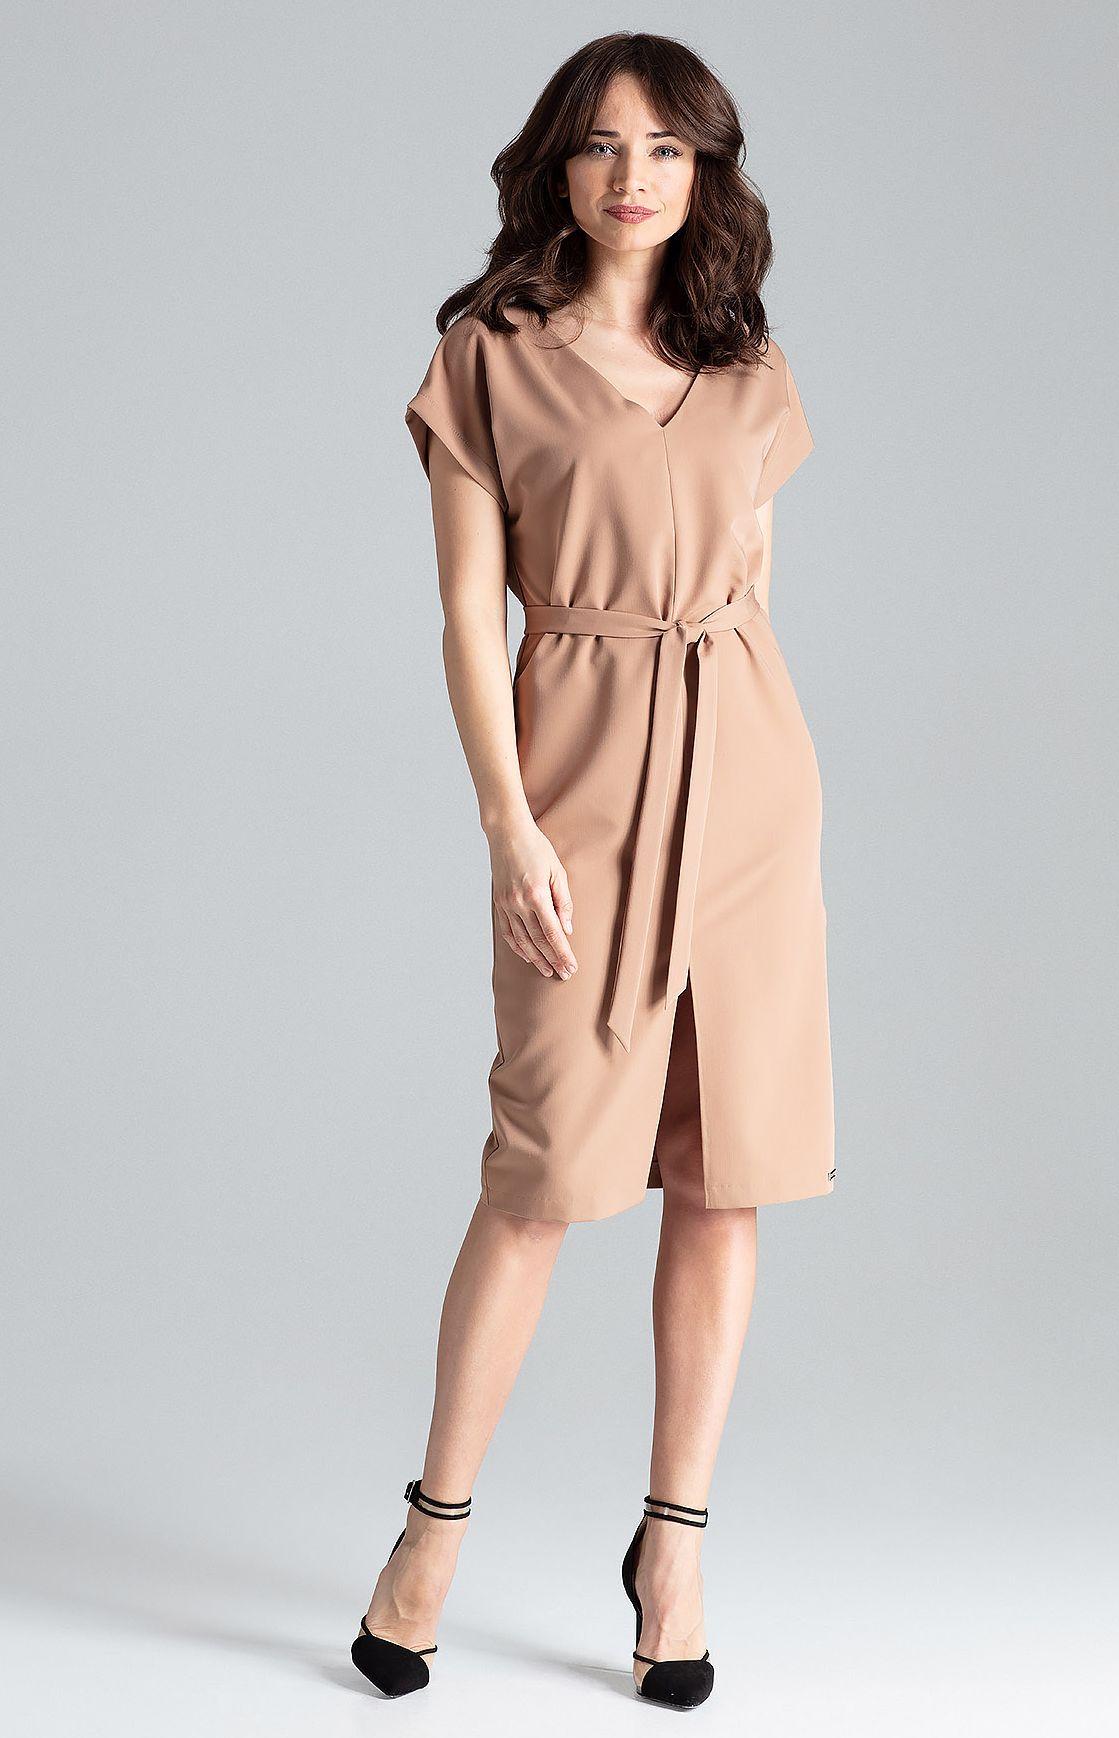 8cc17e91650 Robe droite manches courtes marron LEN032M   idresstocode  boutique ...